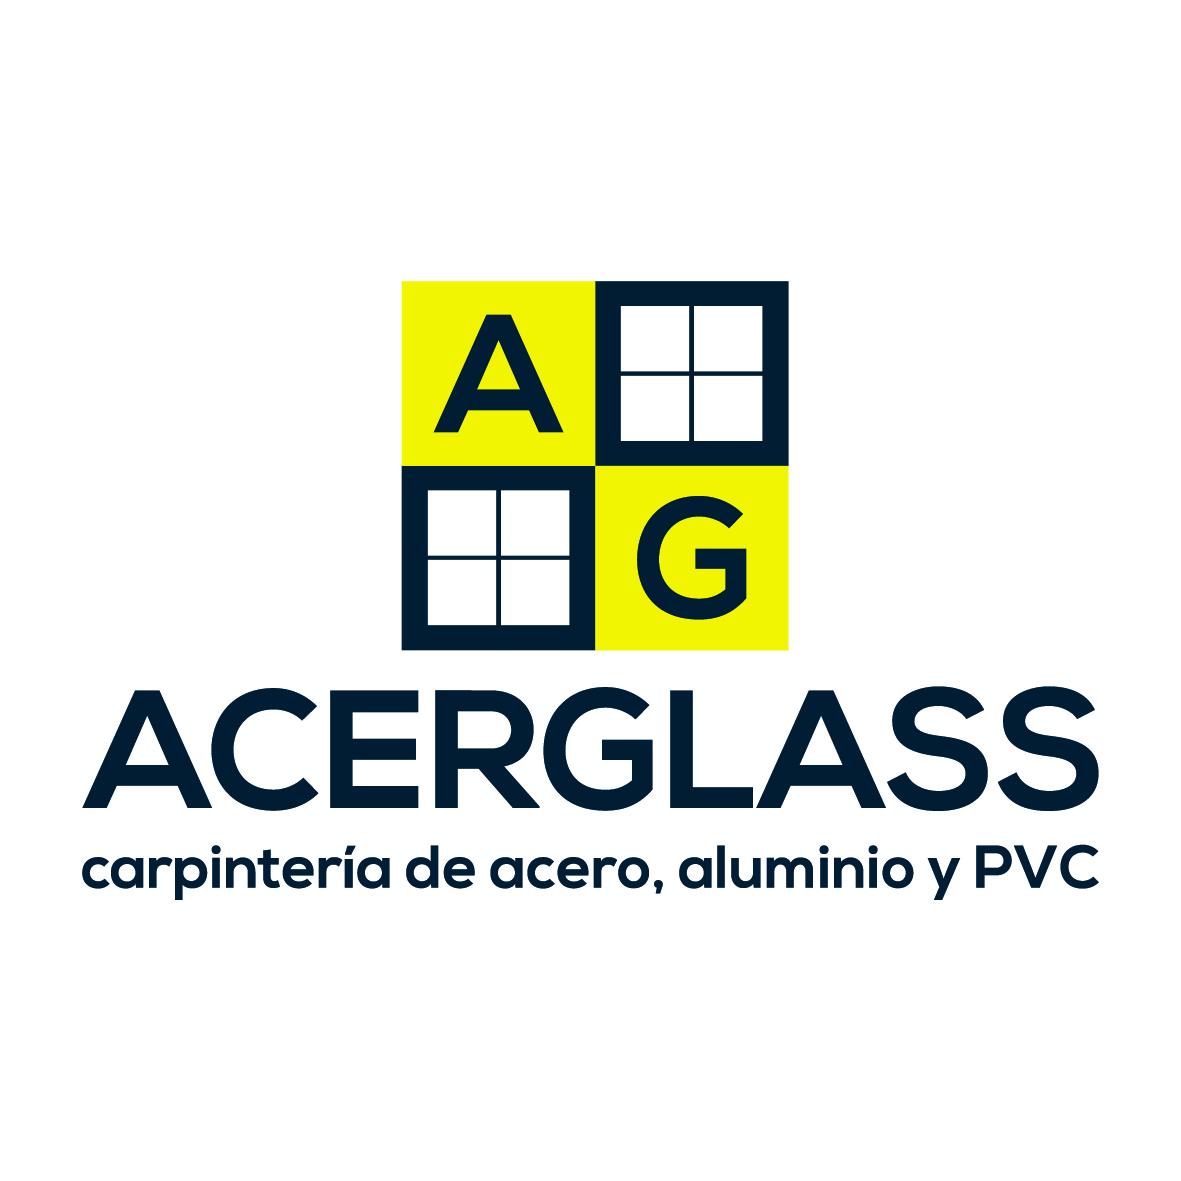 Acerglass